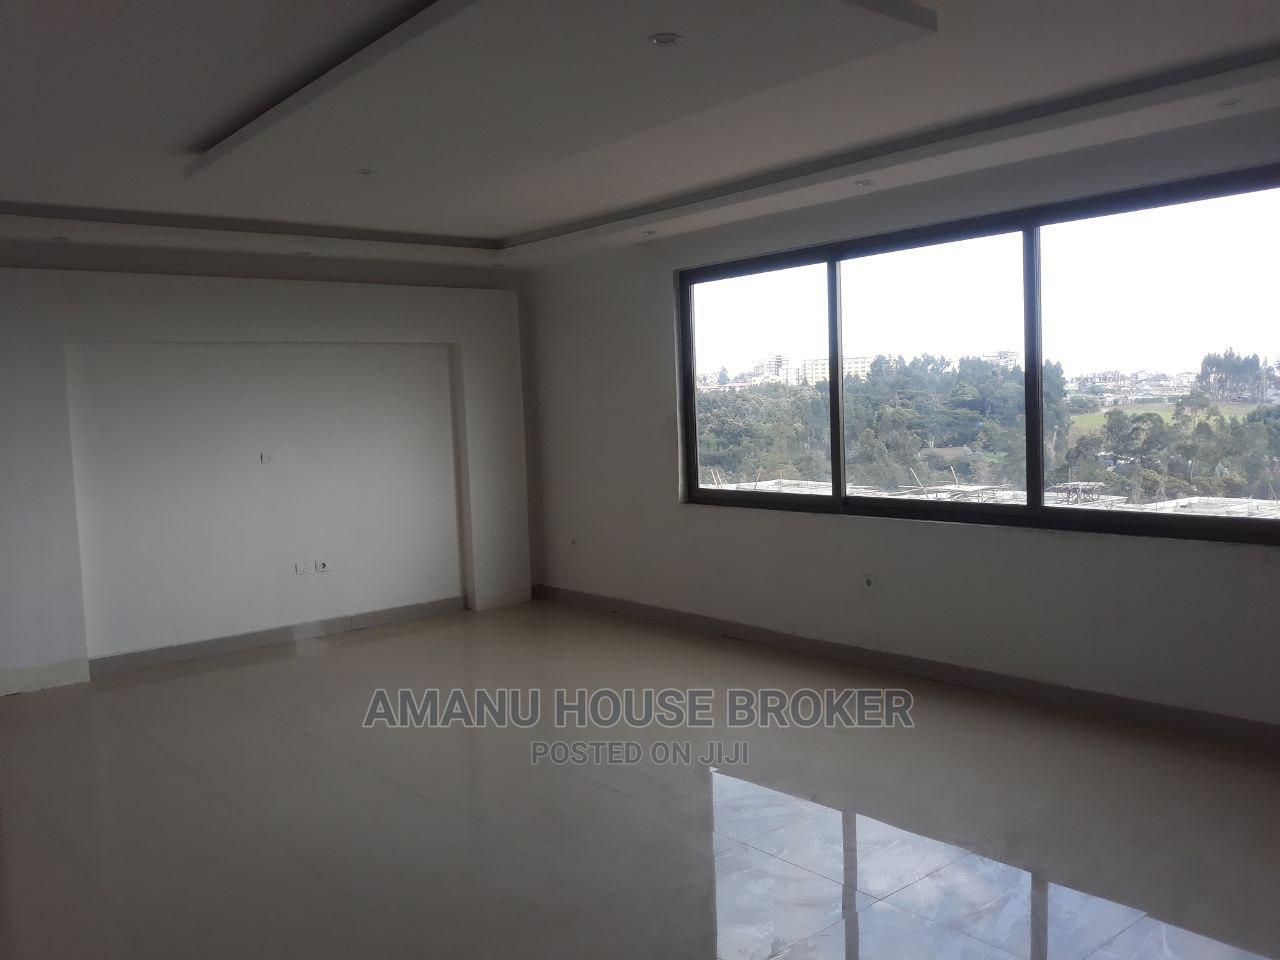 2bdrm Apartment in Addis Abeba, Bole for Rent